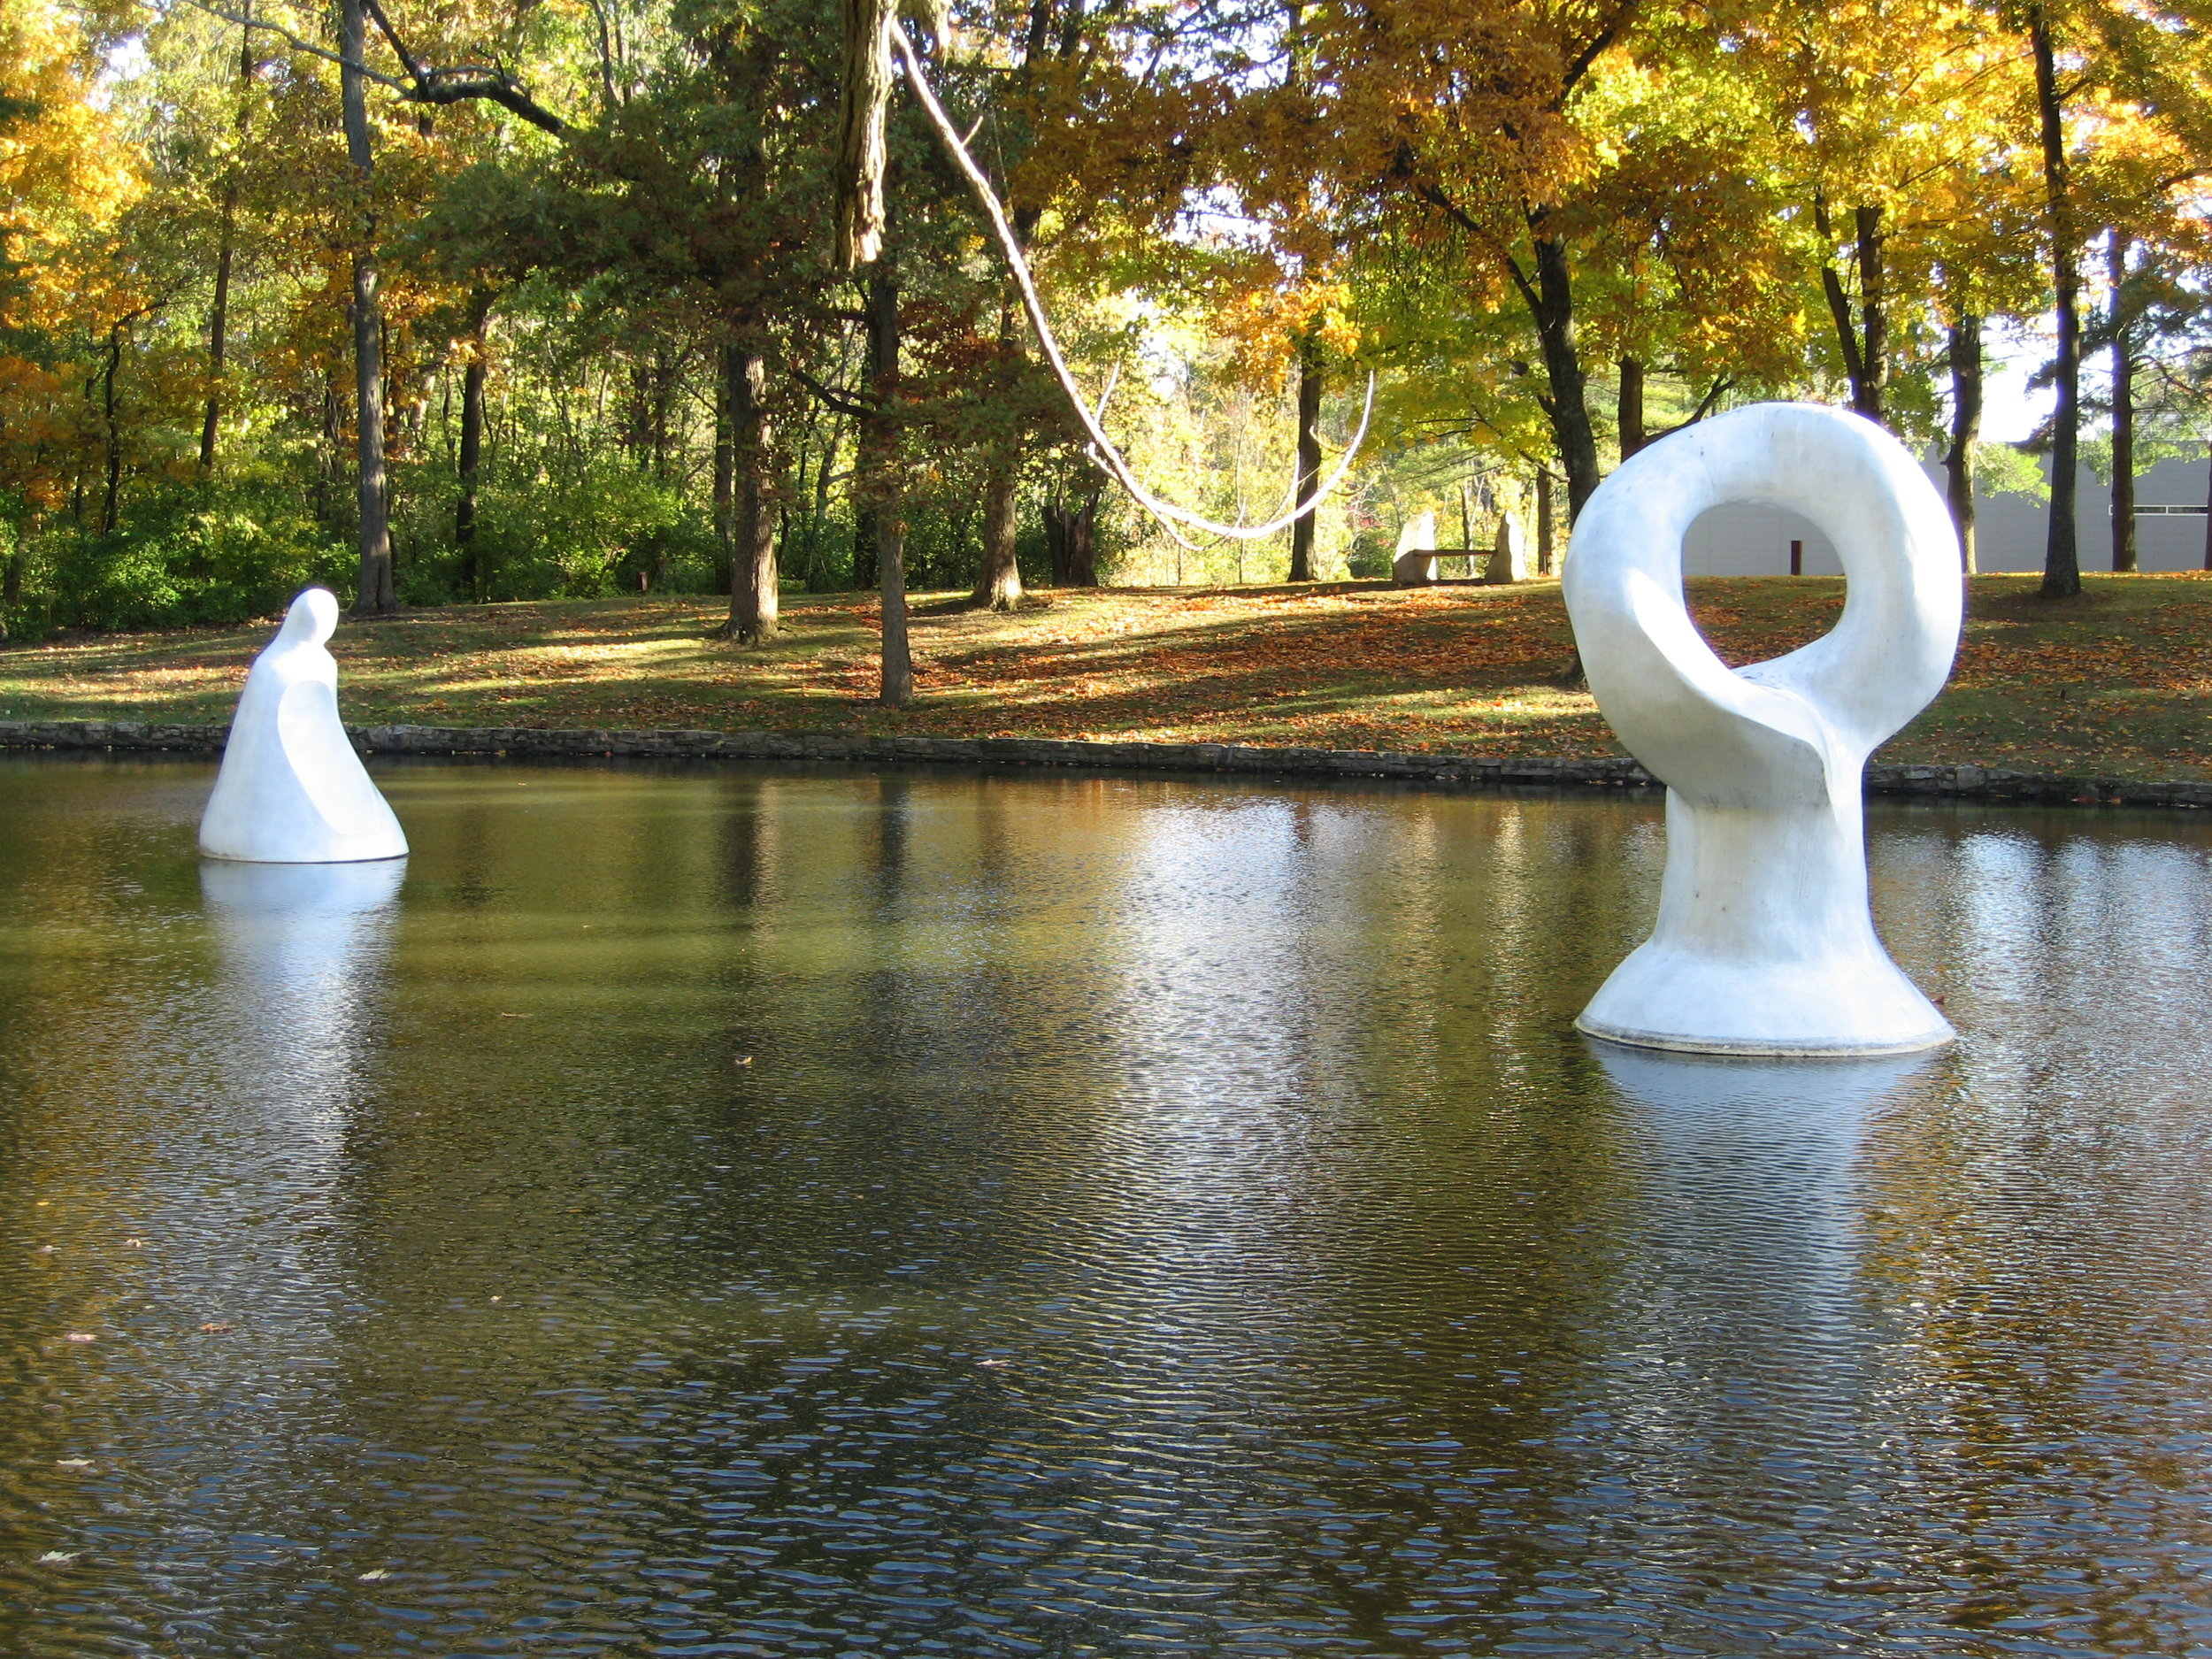 Photo by Cedarhurst Center for the Arts